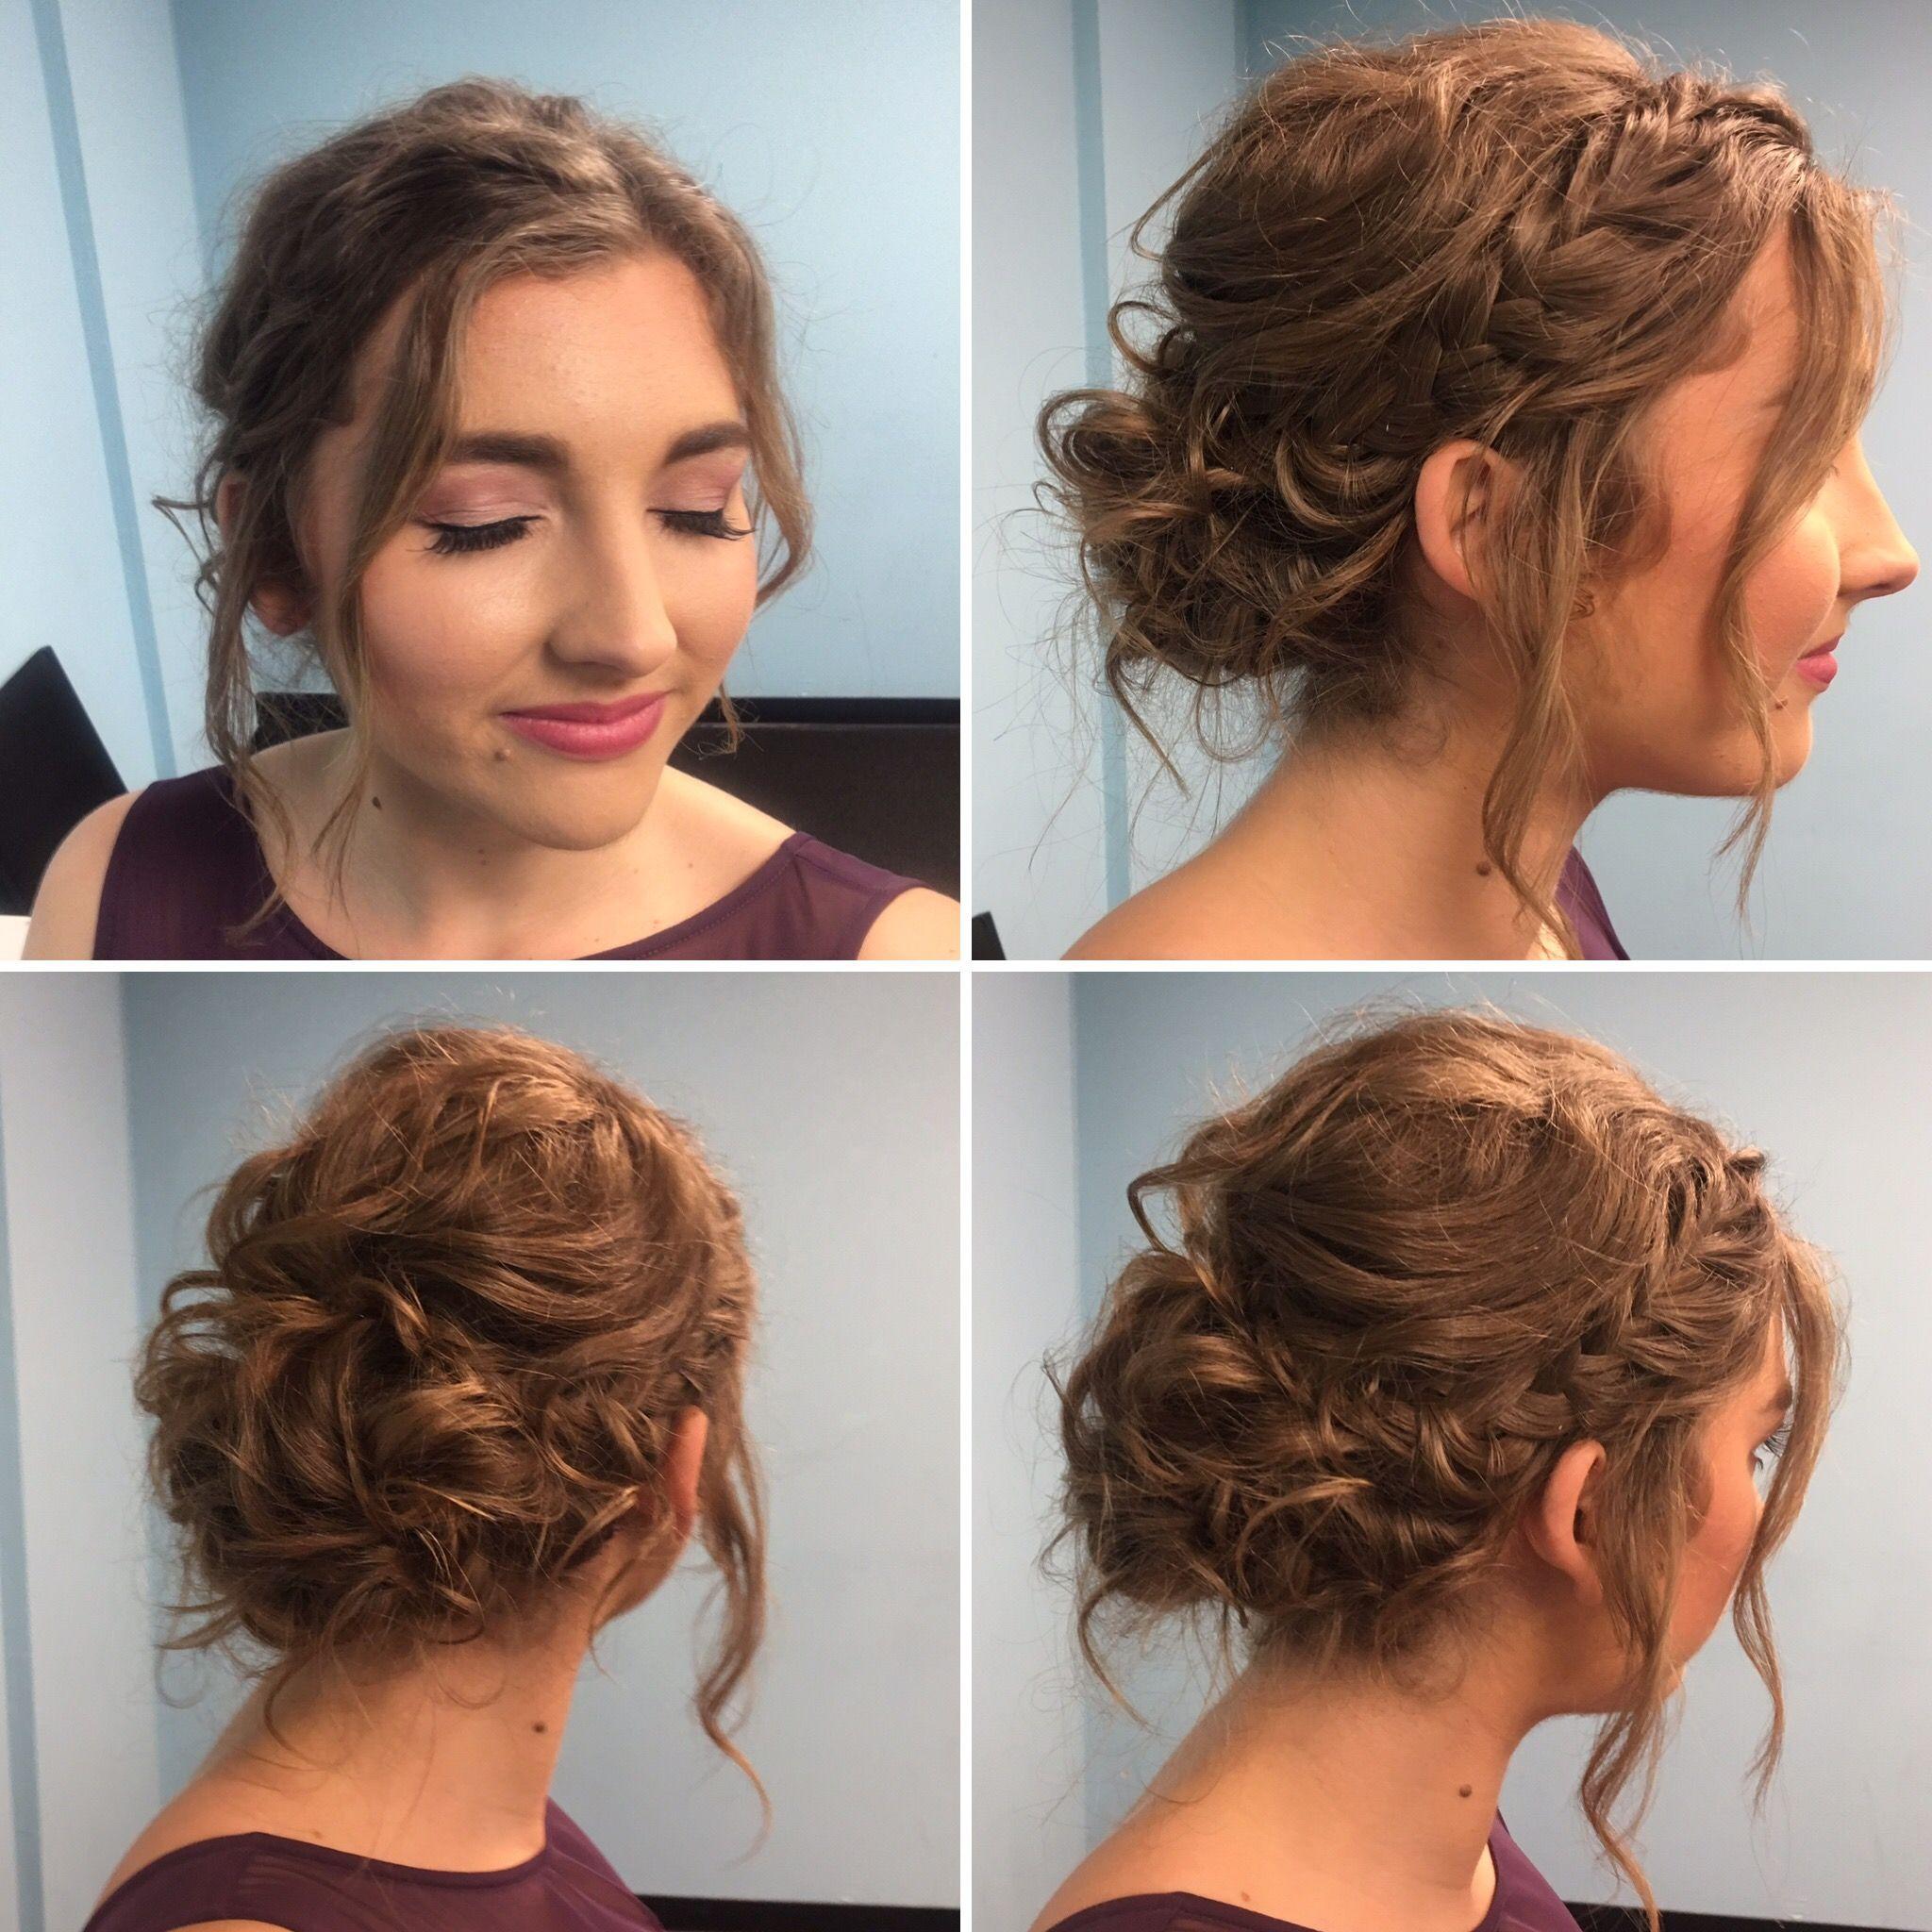 Bridesmaid Hair Short Updo Makeup Shoulder Length